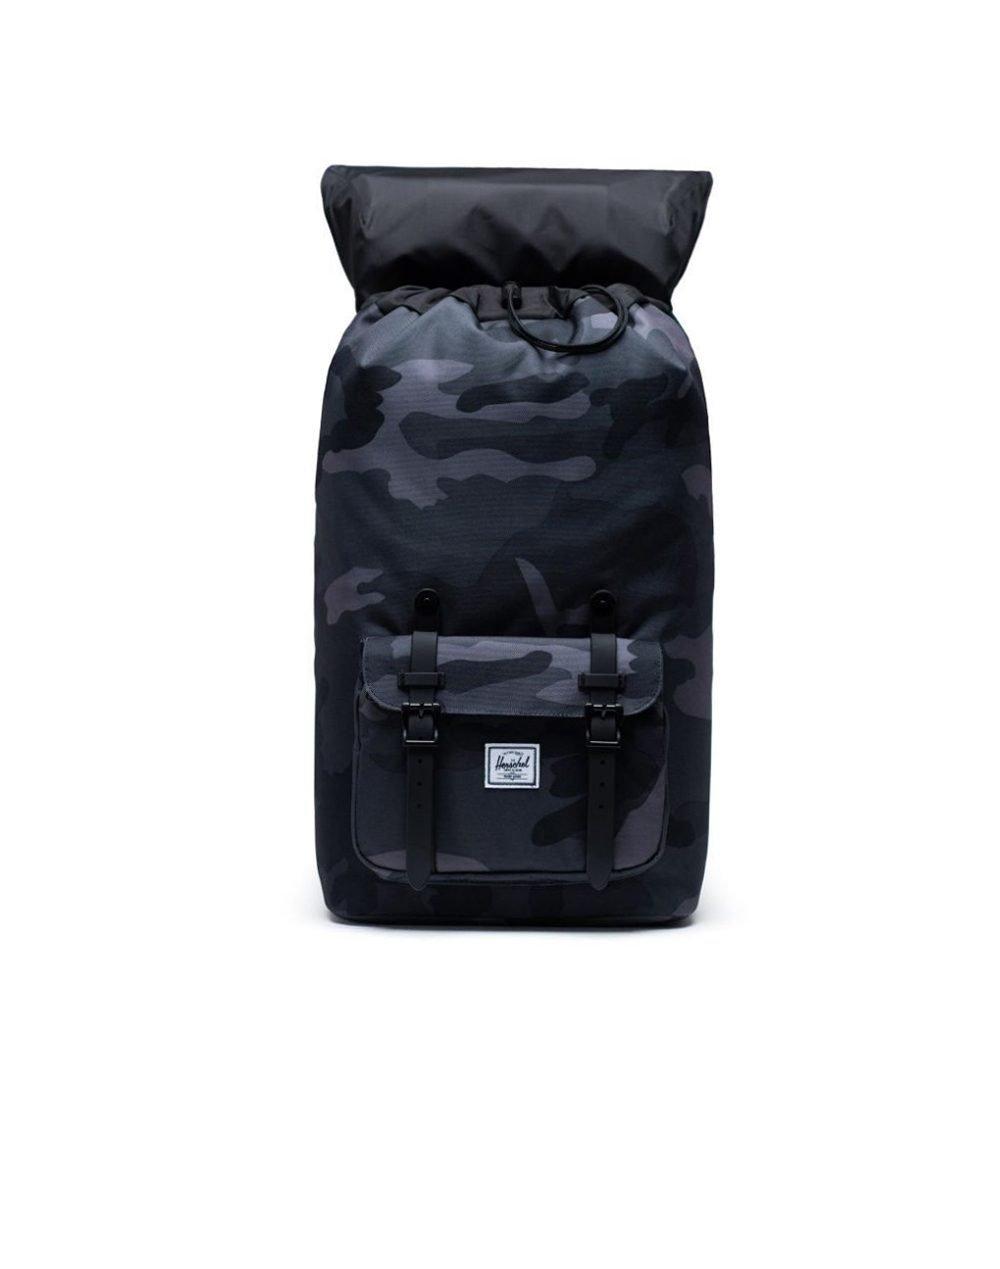 Herschel Supply Co Little America 25L (10014-02992) Black Camo